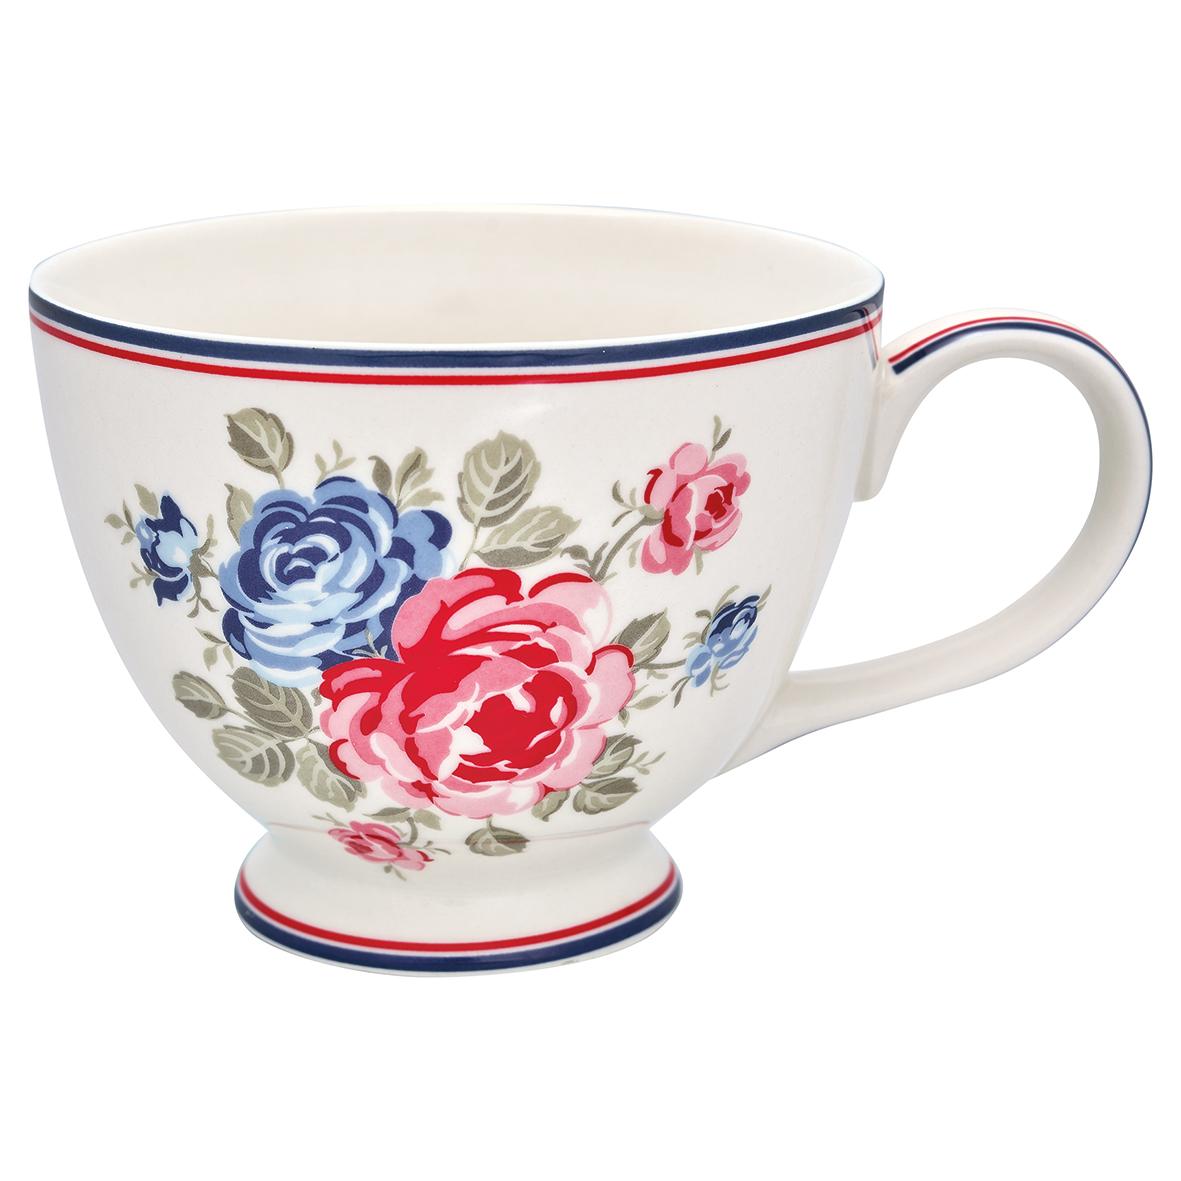 Greengate Teacup Hailey white Becher